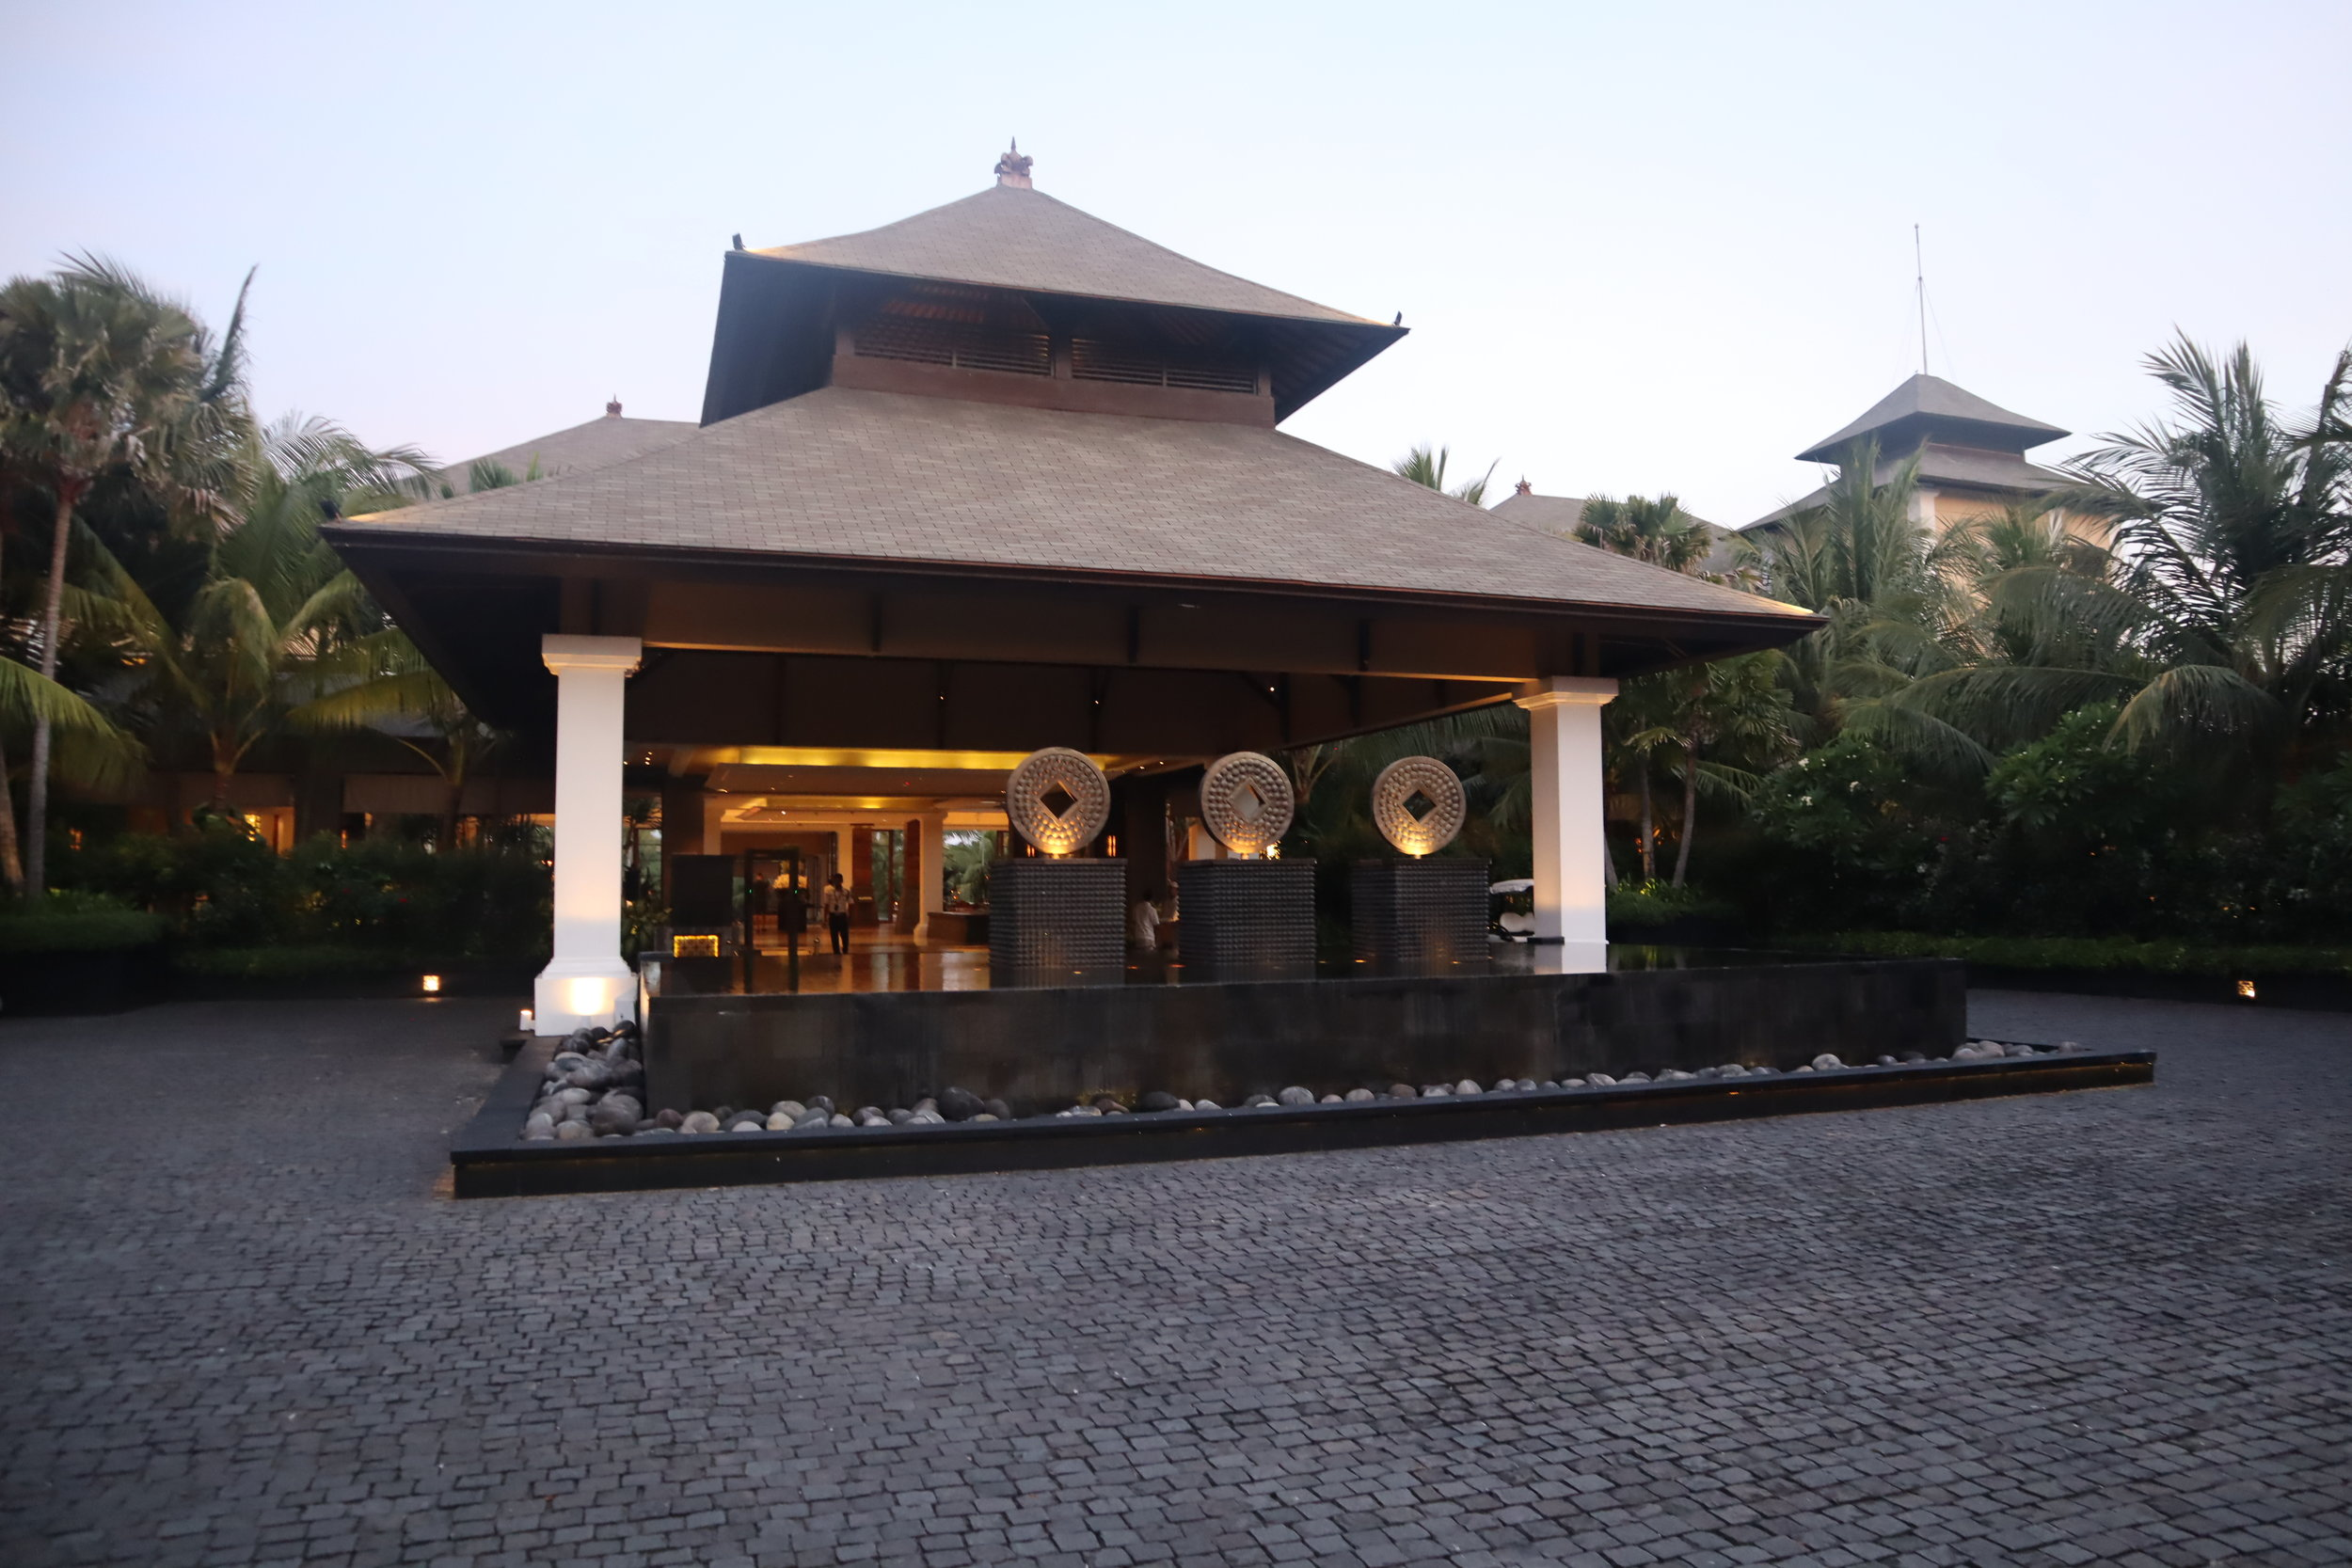 St. Regis Bali – Main building